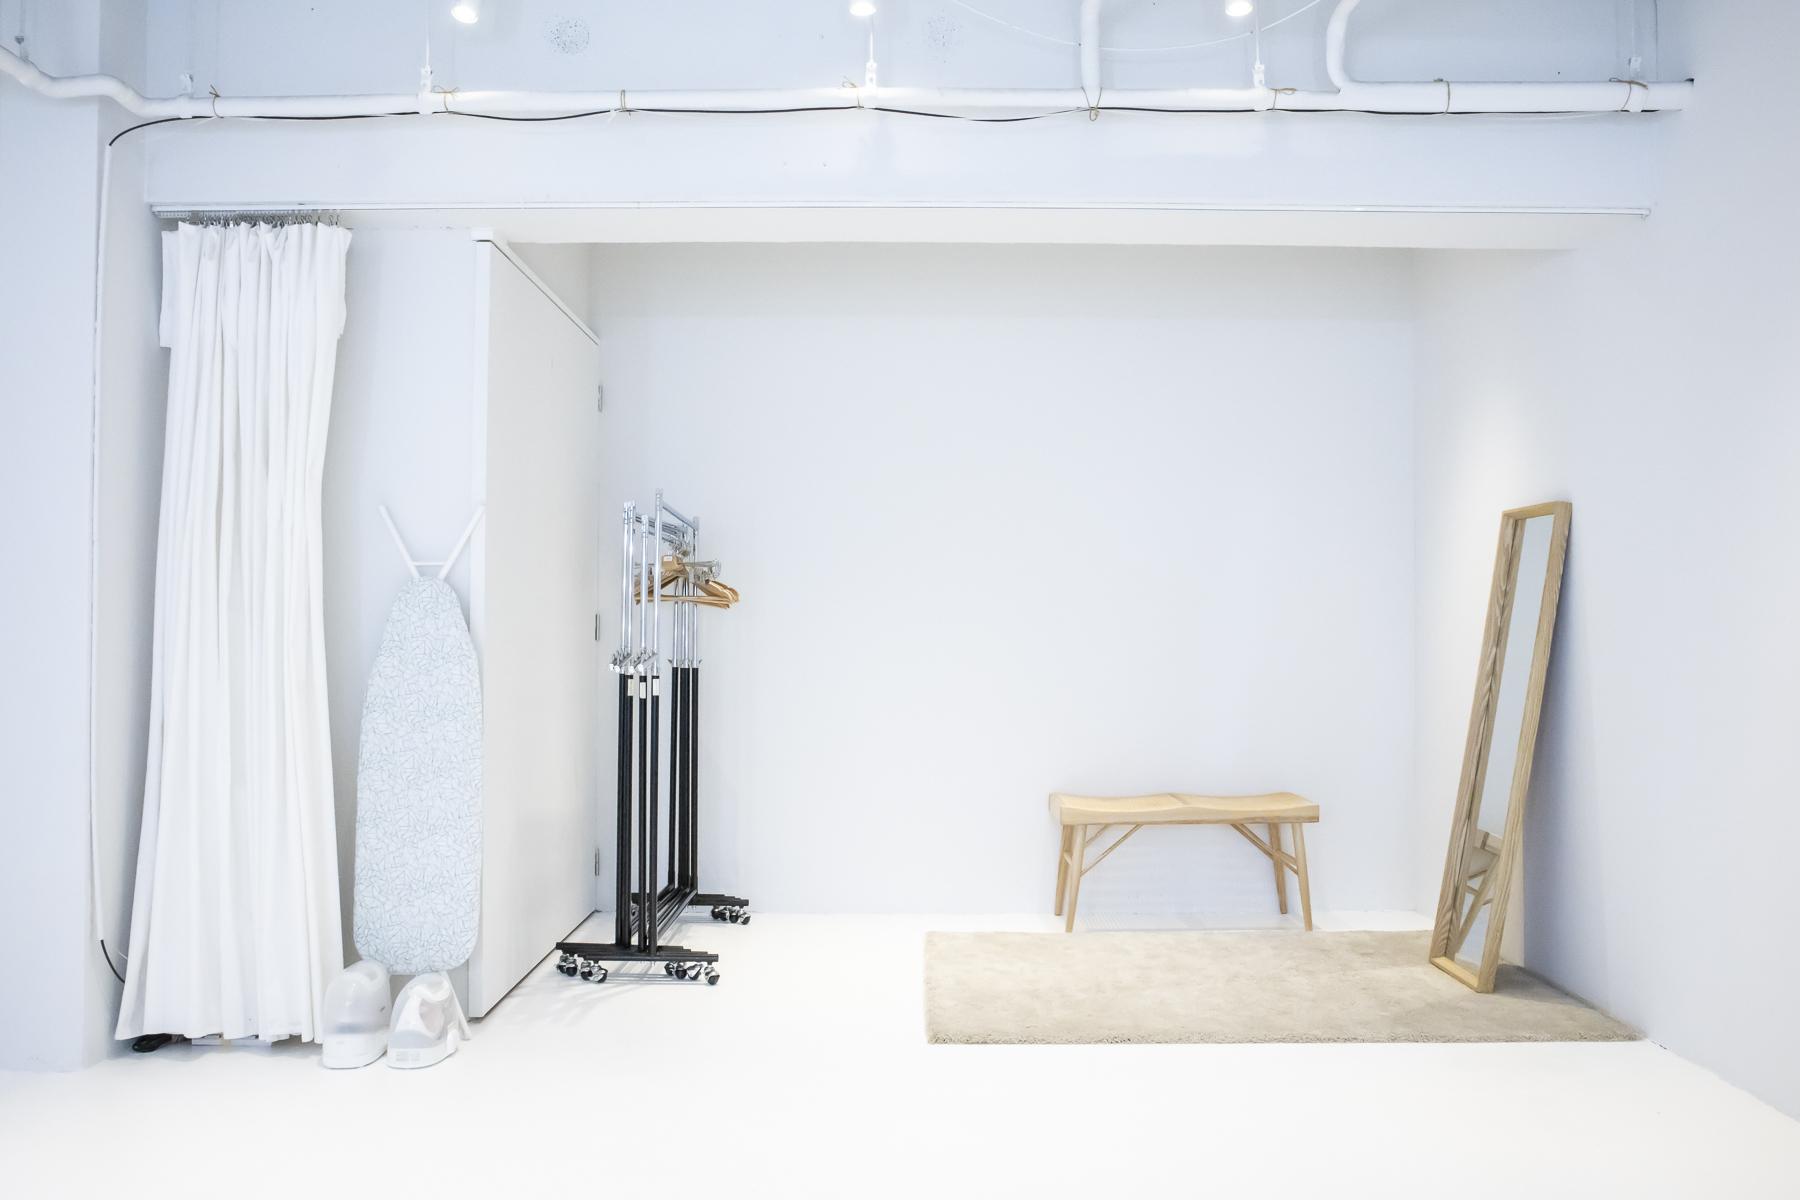 STUDIO SAND 2F (スタジオサンド2F)大型ハリウッドミラー